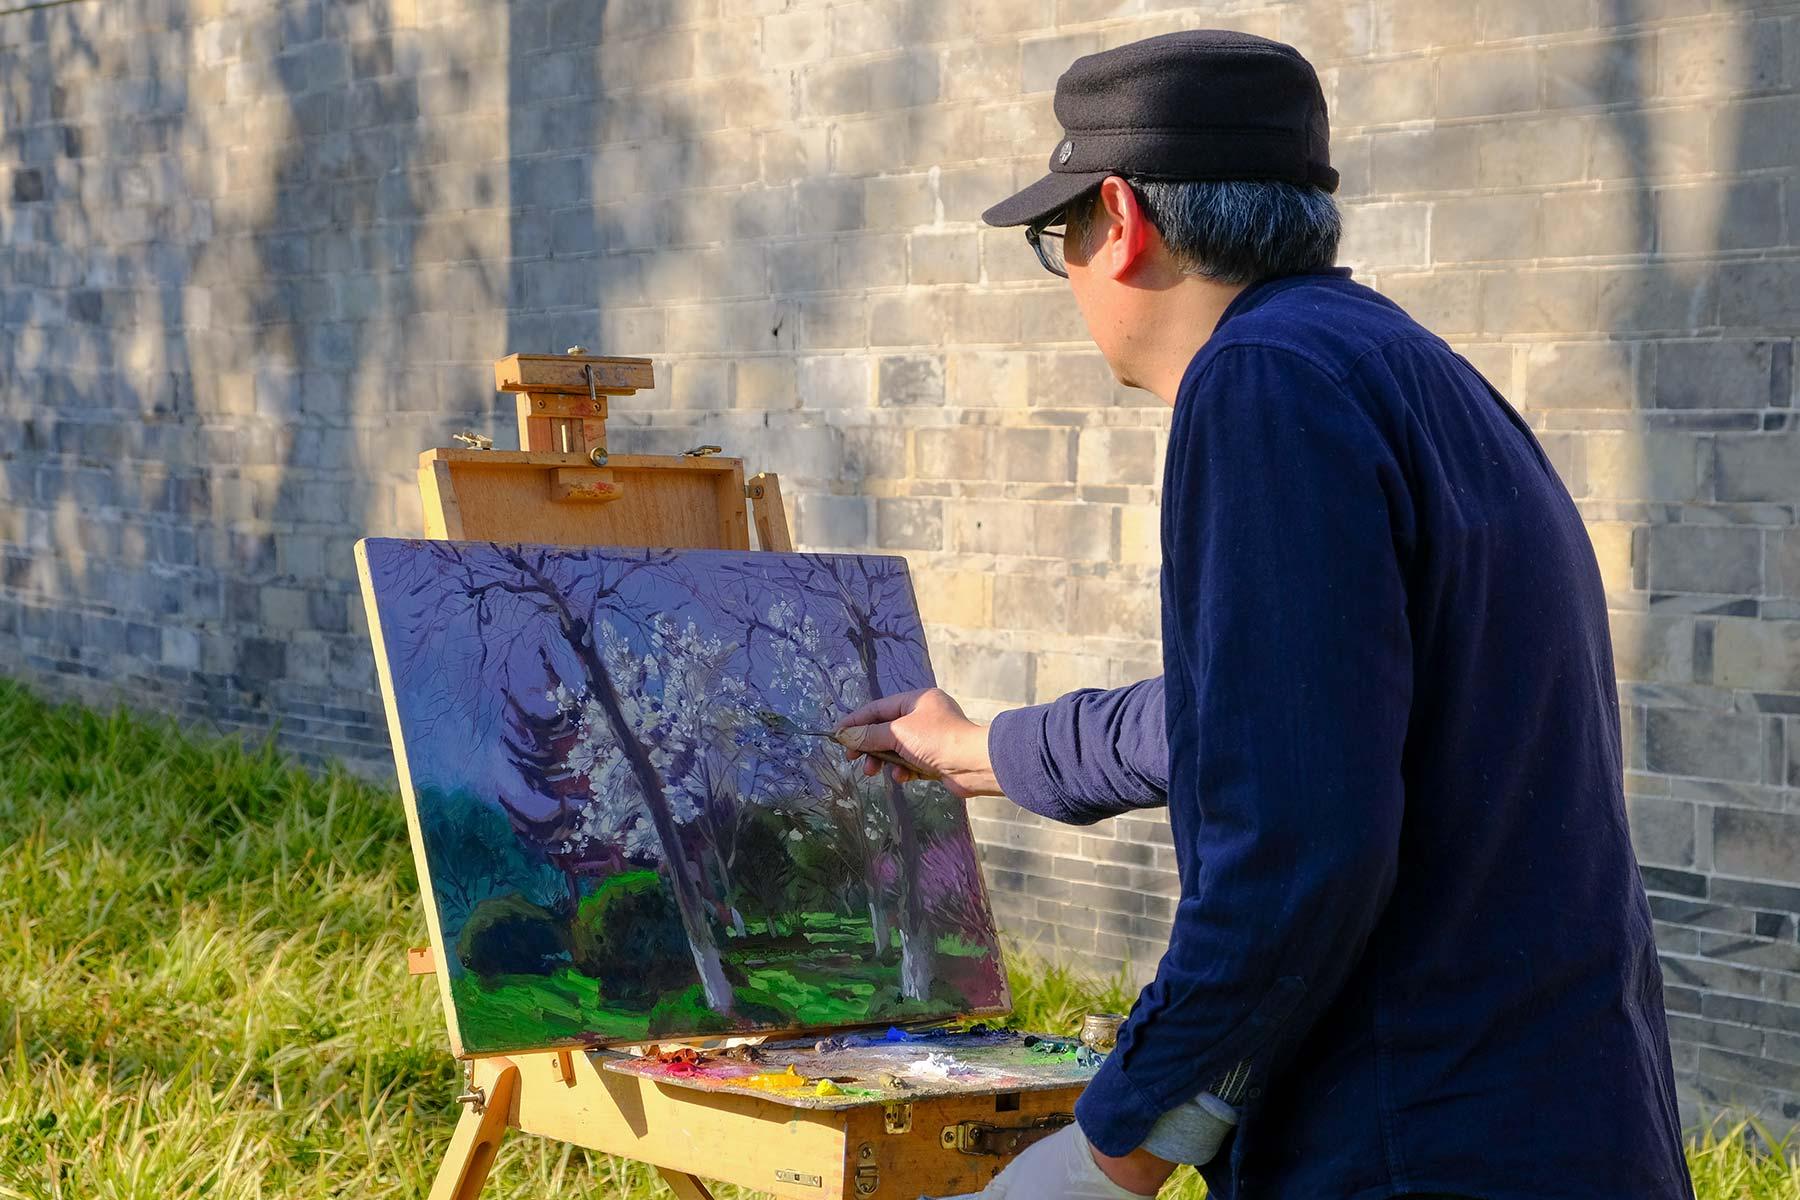 Mann malt Bild im Frühling im Zhongshan Park in Ningbo, China